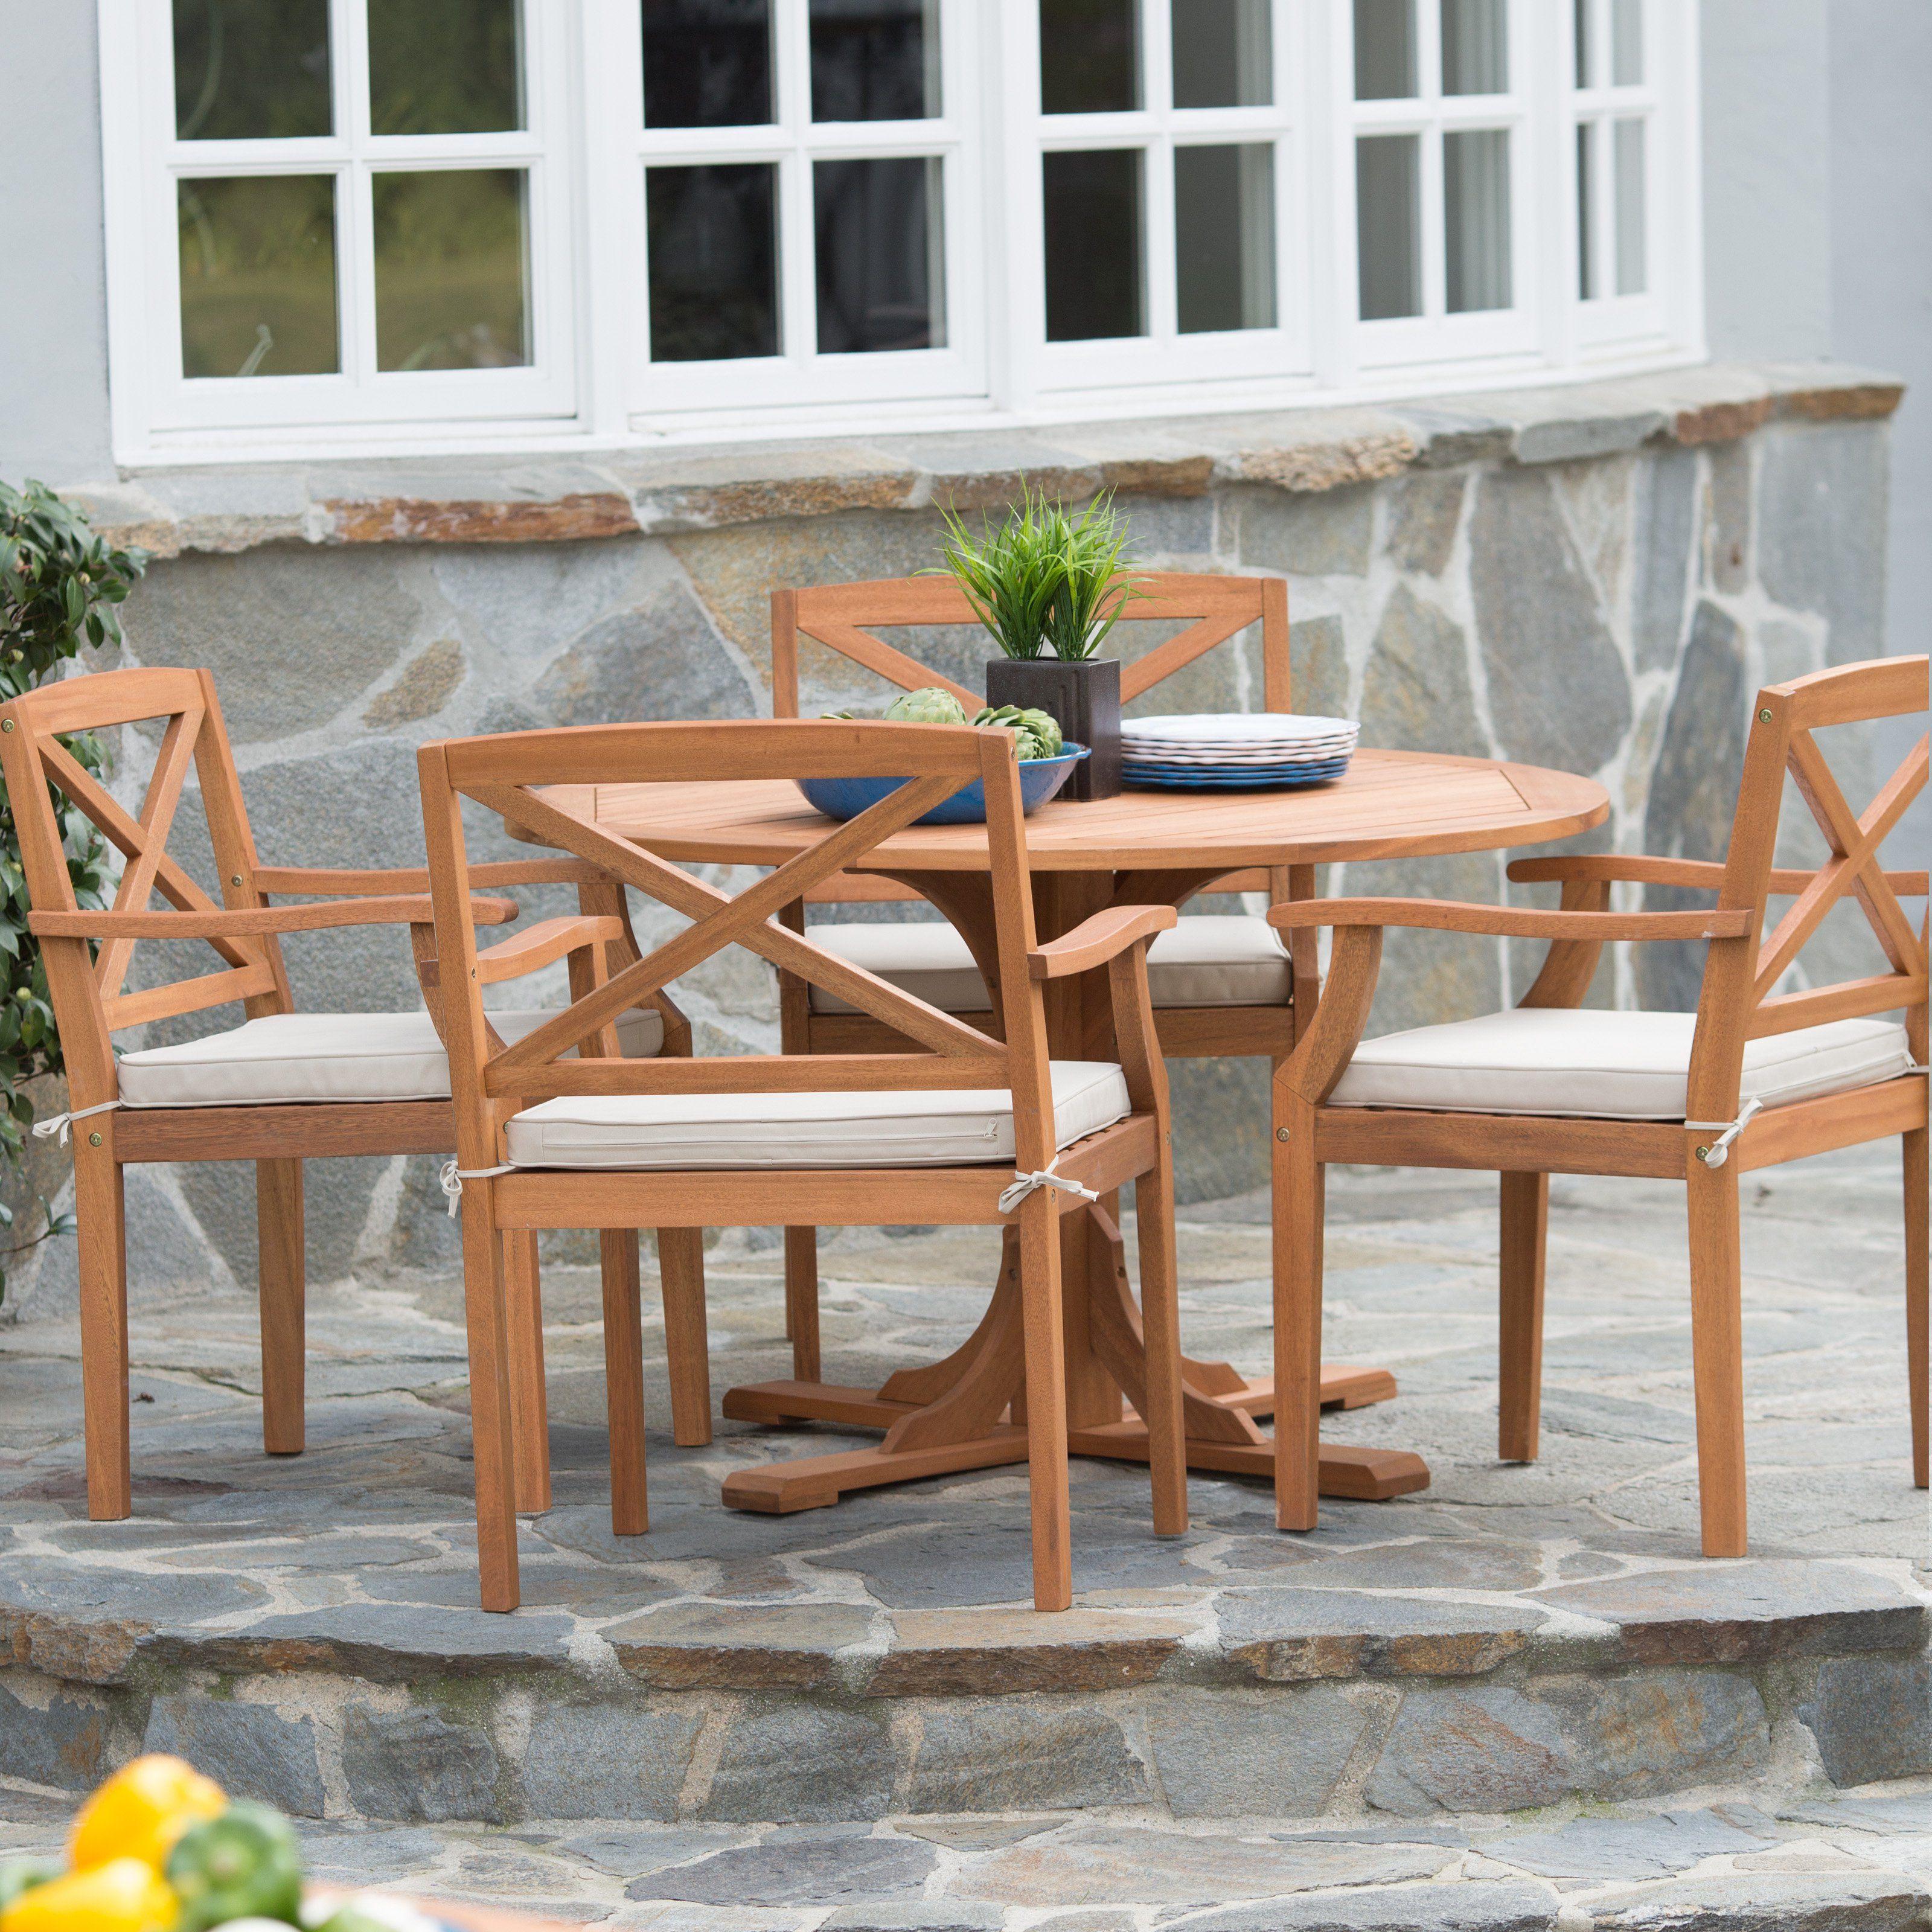 Belham Living Brighton Outdoor Wood Round Patio Dining Set   Seats